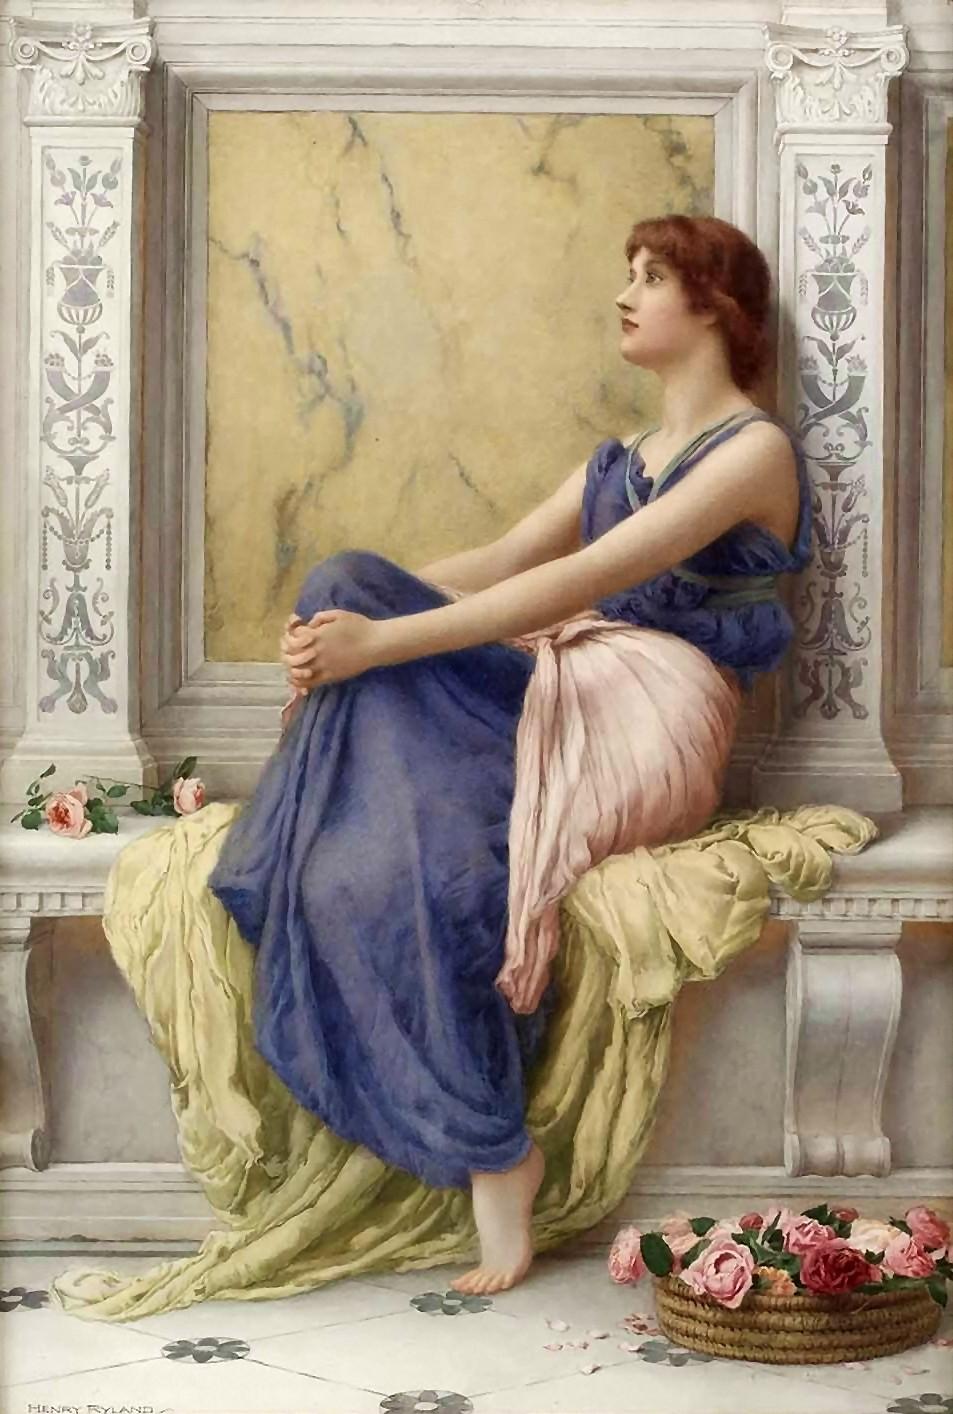 Henry Ryland - A Neo-Classical / Pre-Raphaelite British Painter